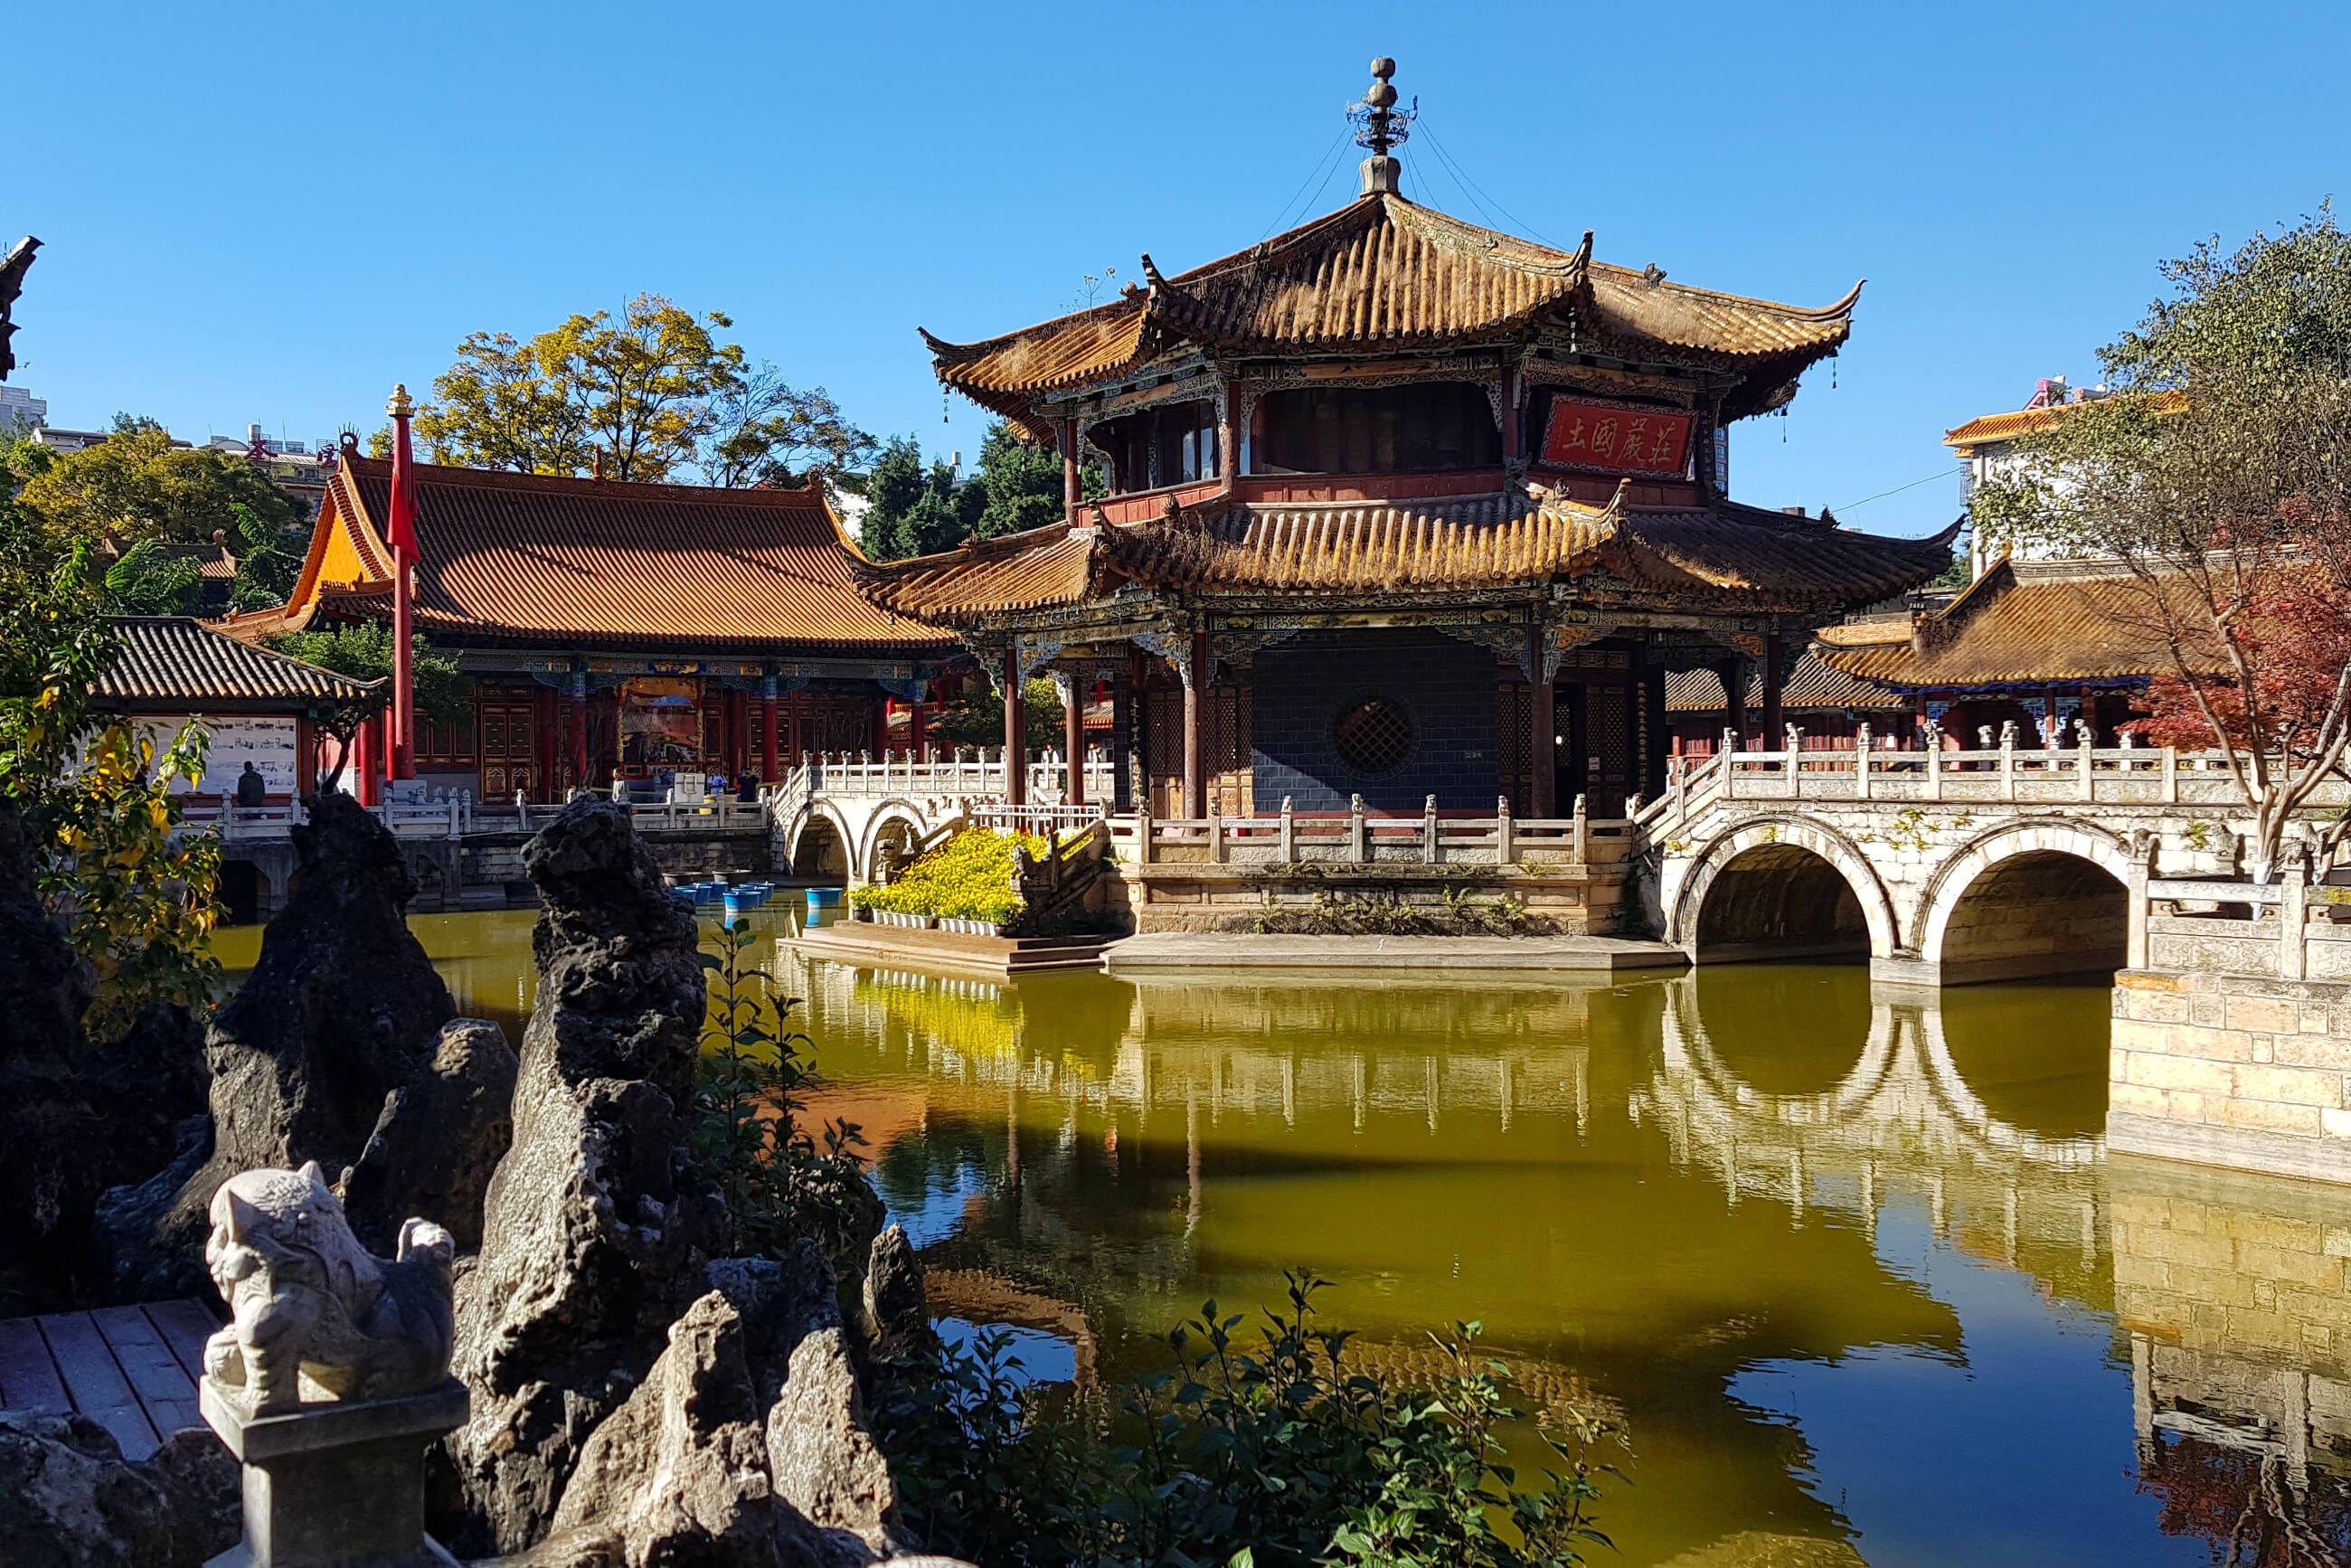 https://bubo.sk/uploads/galleries/4915/cina_yuantong-temple_1352525468.jpg